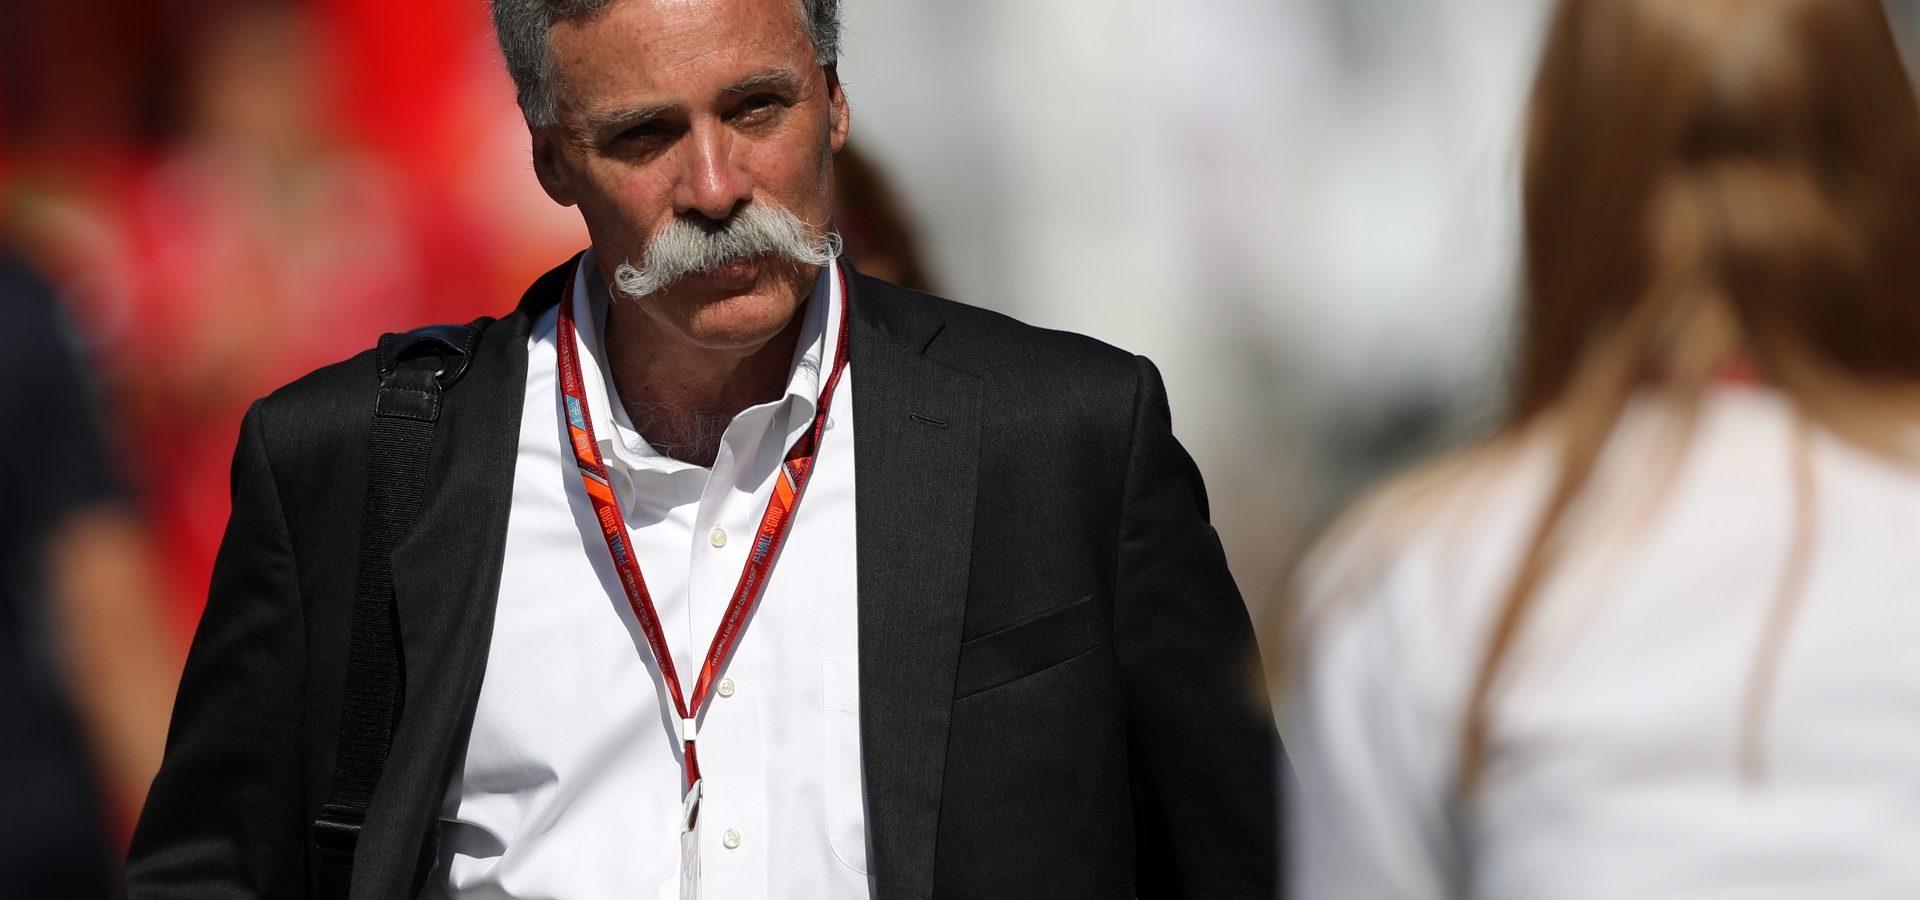 Hungaroring_2017_F1_19